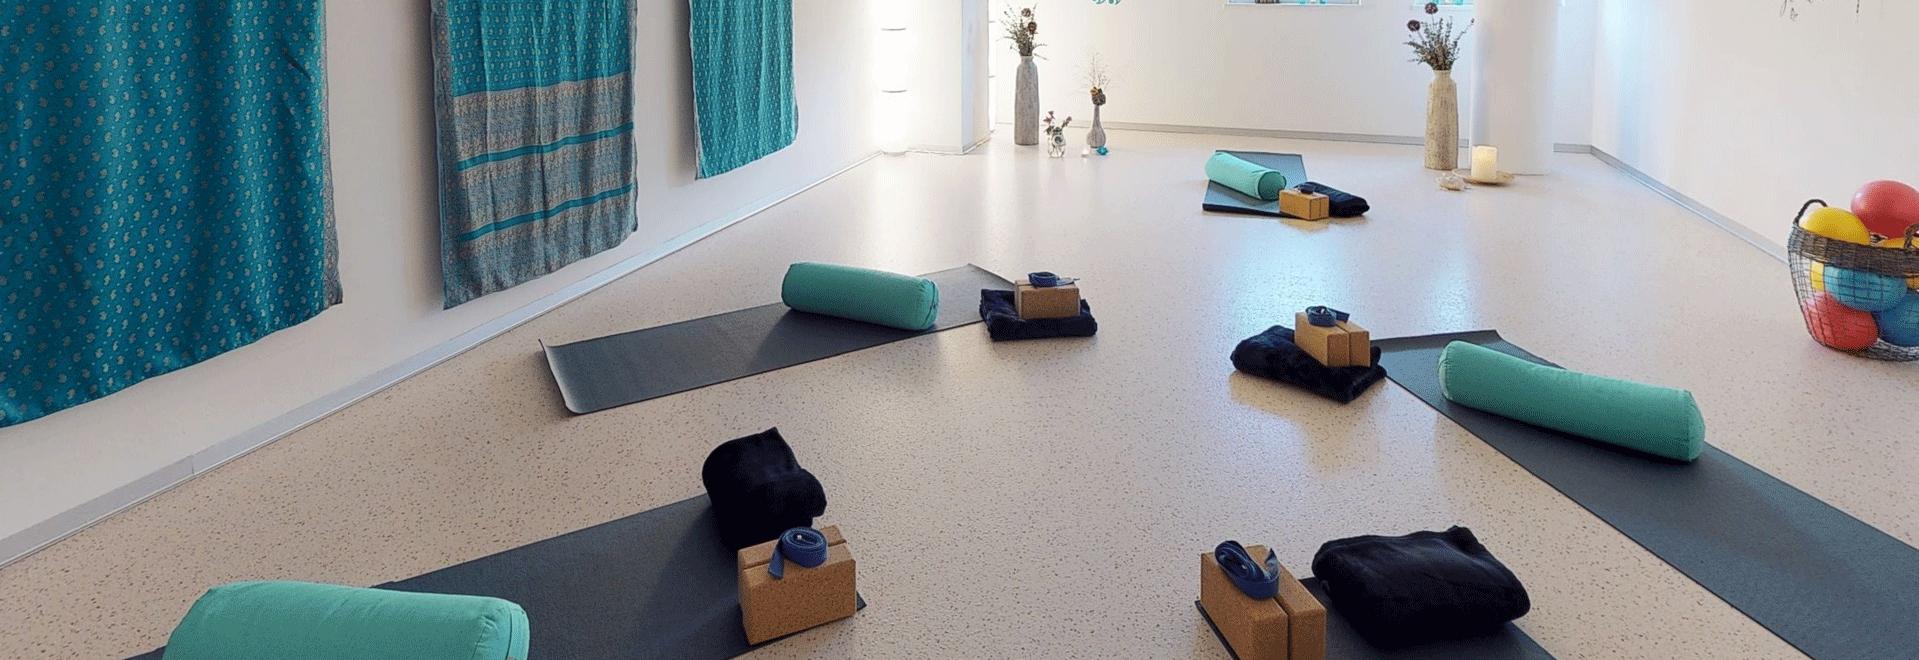 Yogaraum Erlebnistherme Zillertal